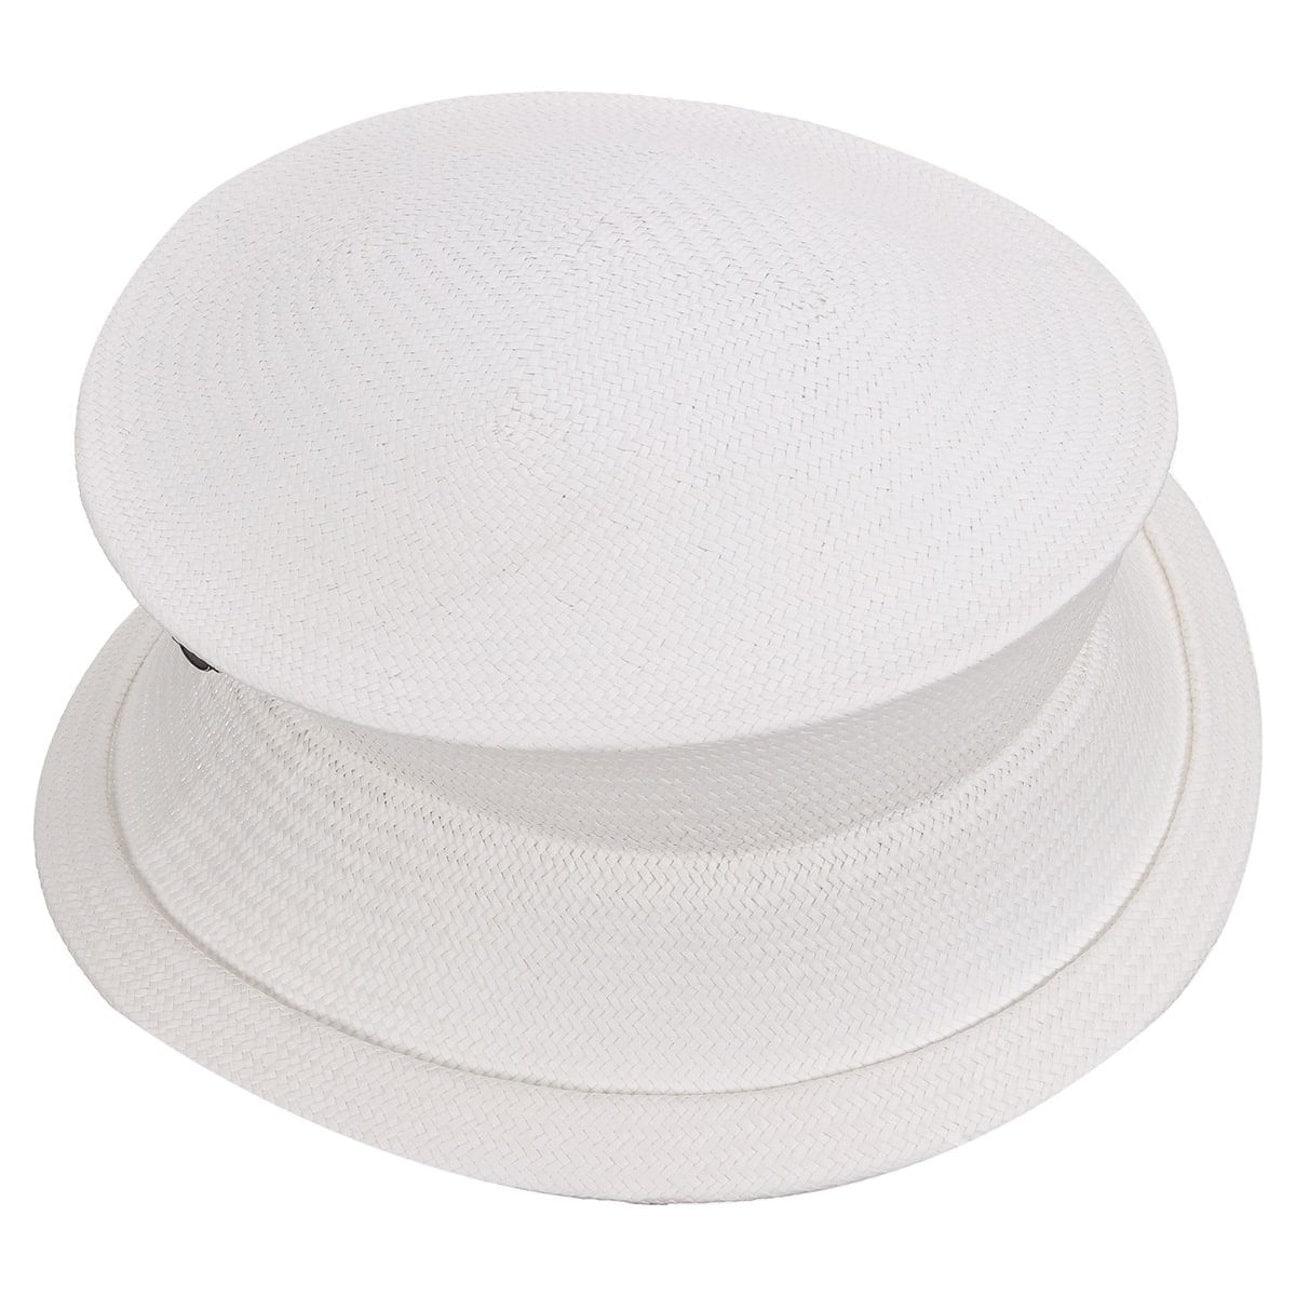 a46813a7a832d Sombrero Plegable Latrobea by Seeberger - Sombreros - sombreroshop.es